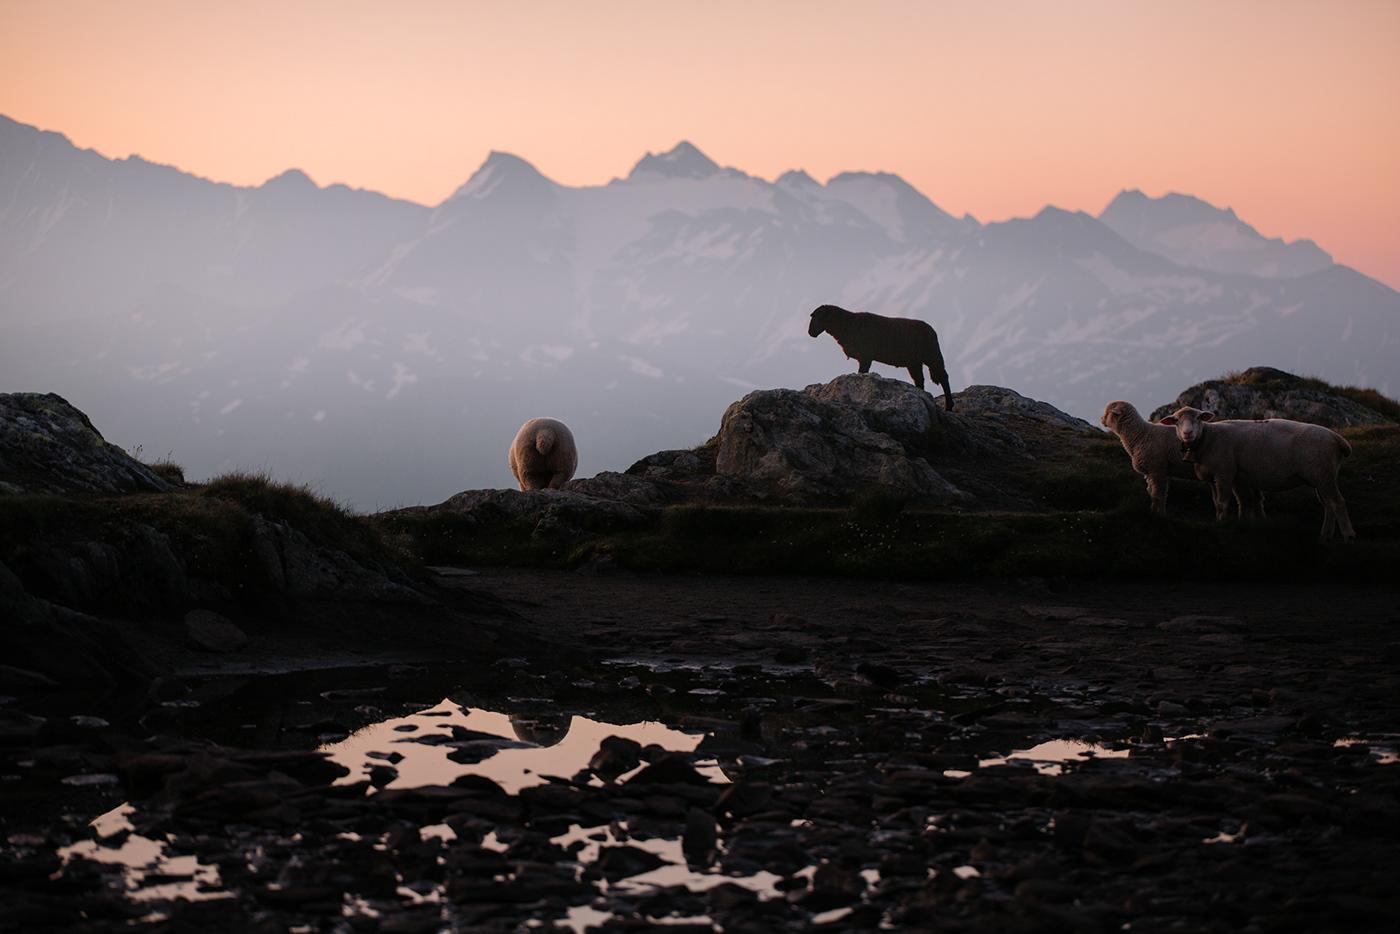 alps animals hiking Landscape mountains Nature Outdoor sheep Switzerland Sunrise